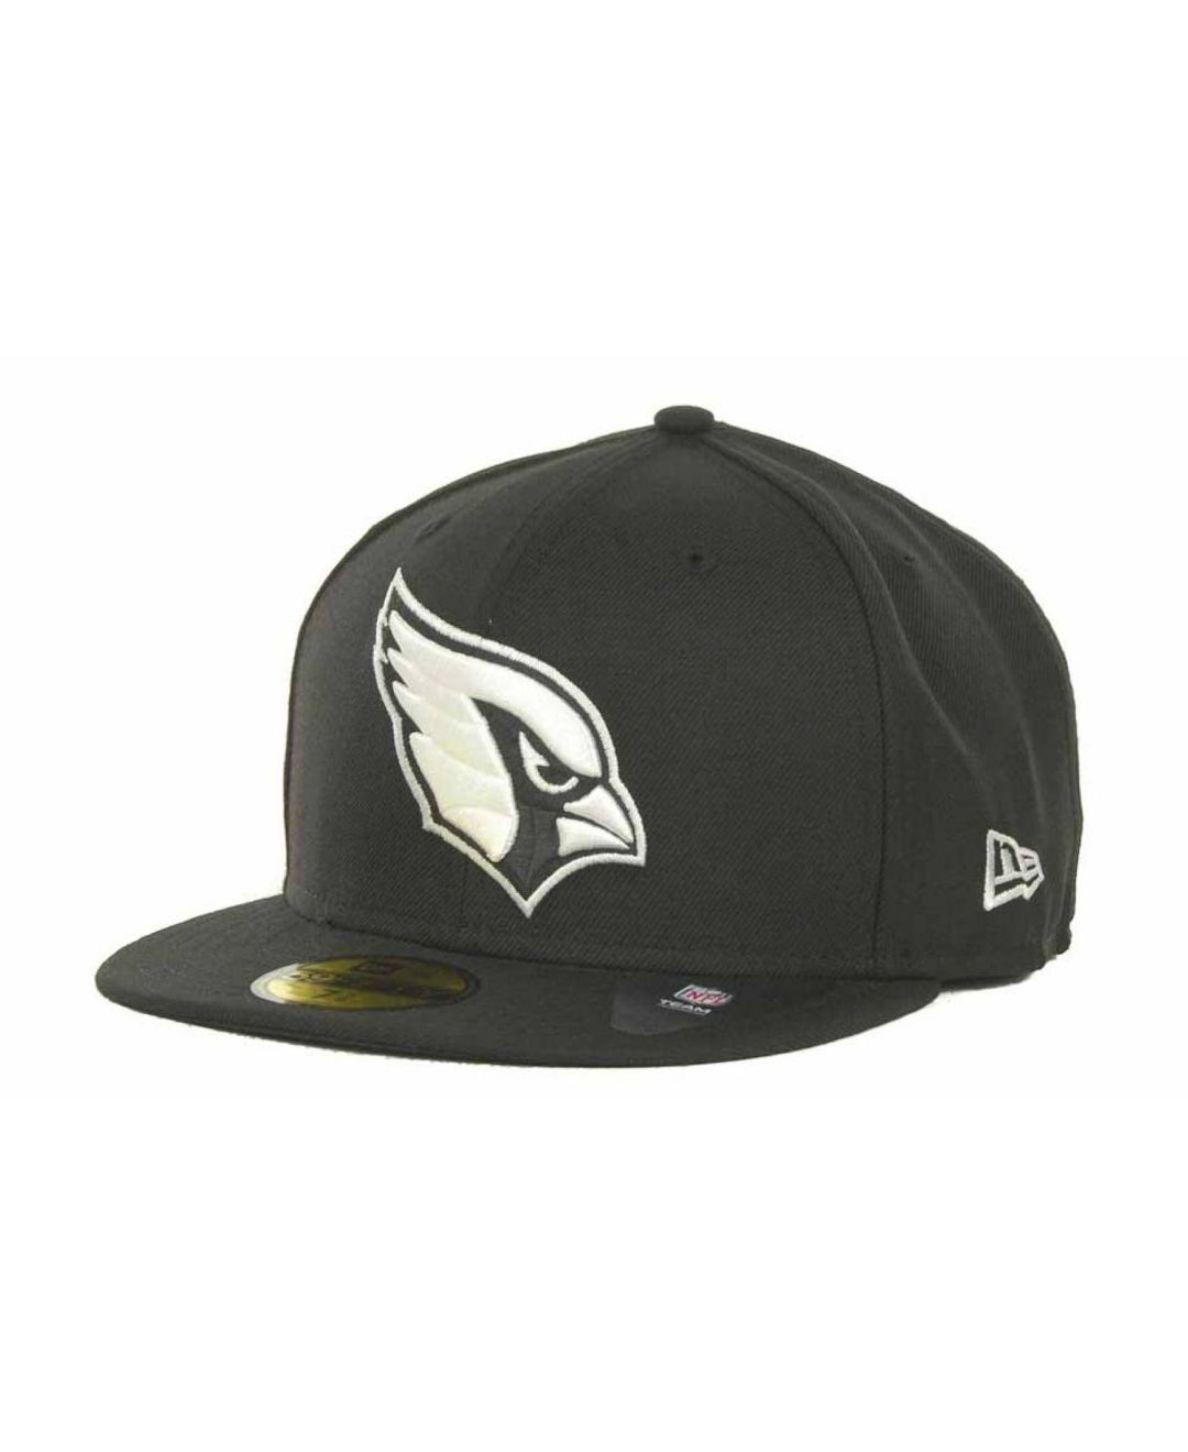 New Era Arizona Cardinals 59fifty Cap Black